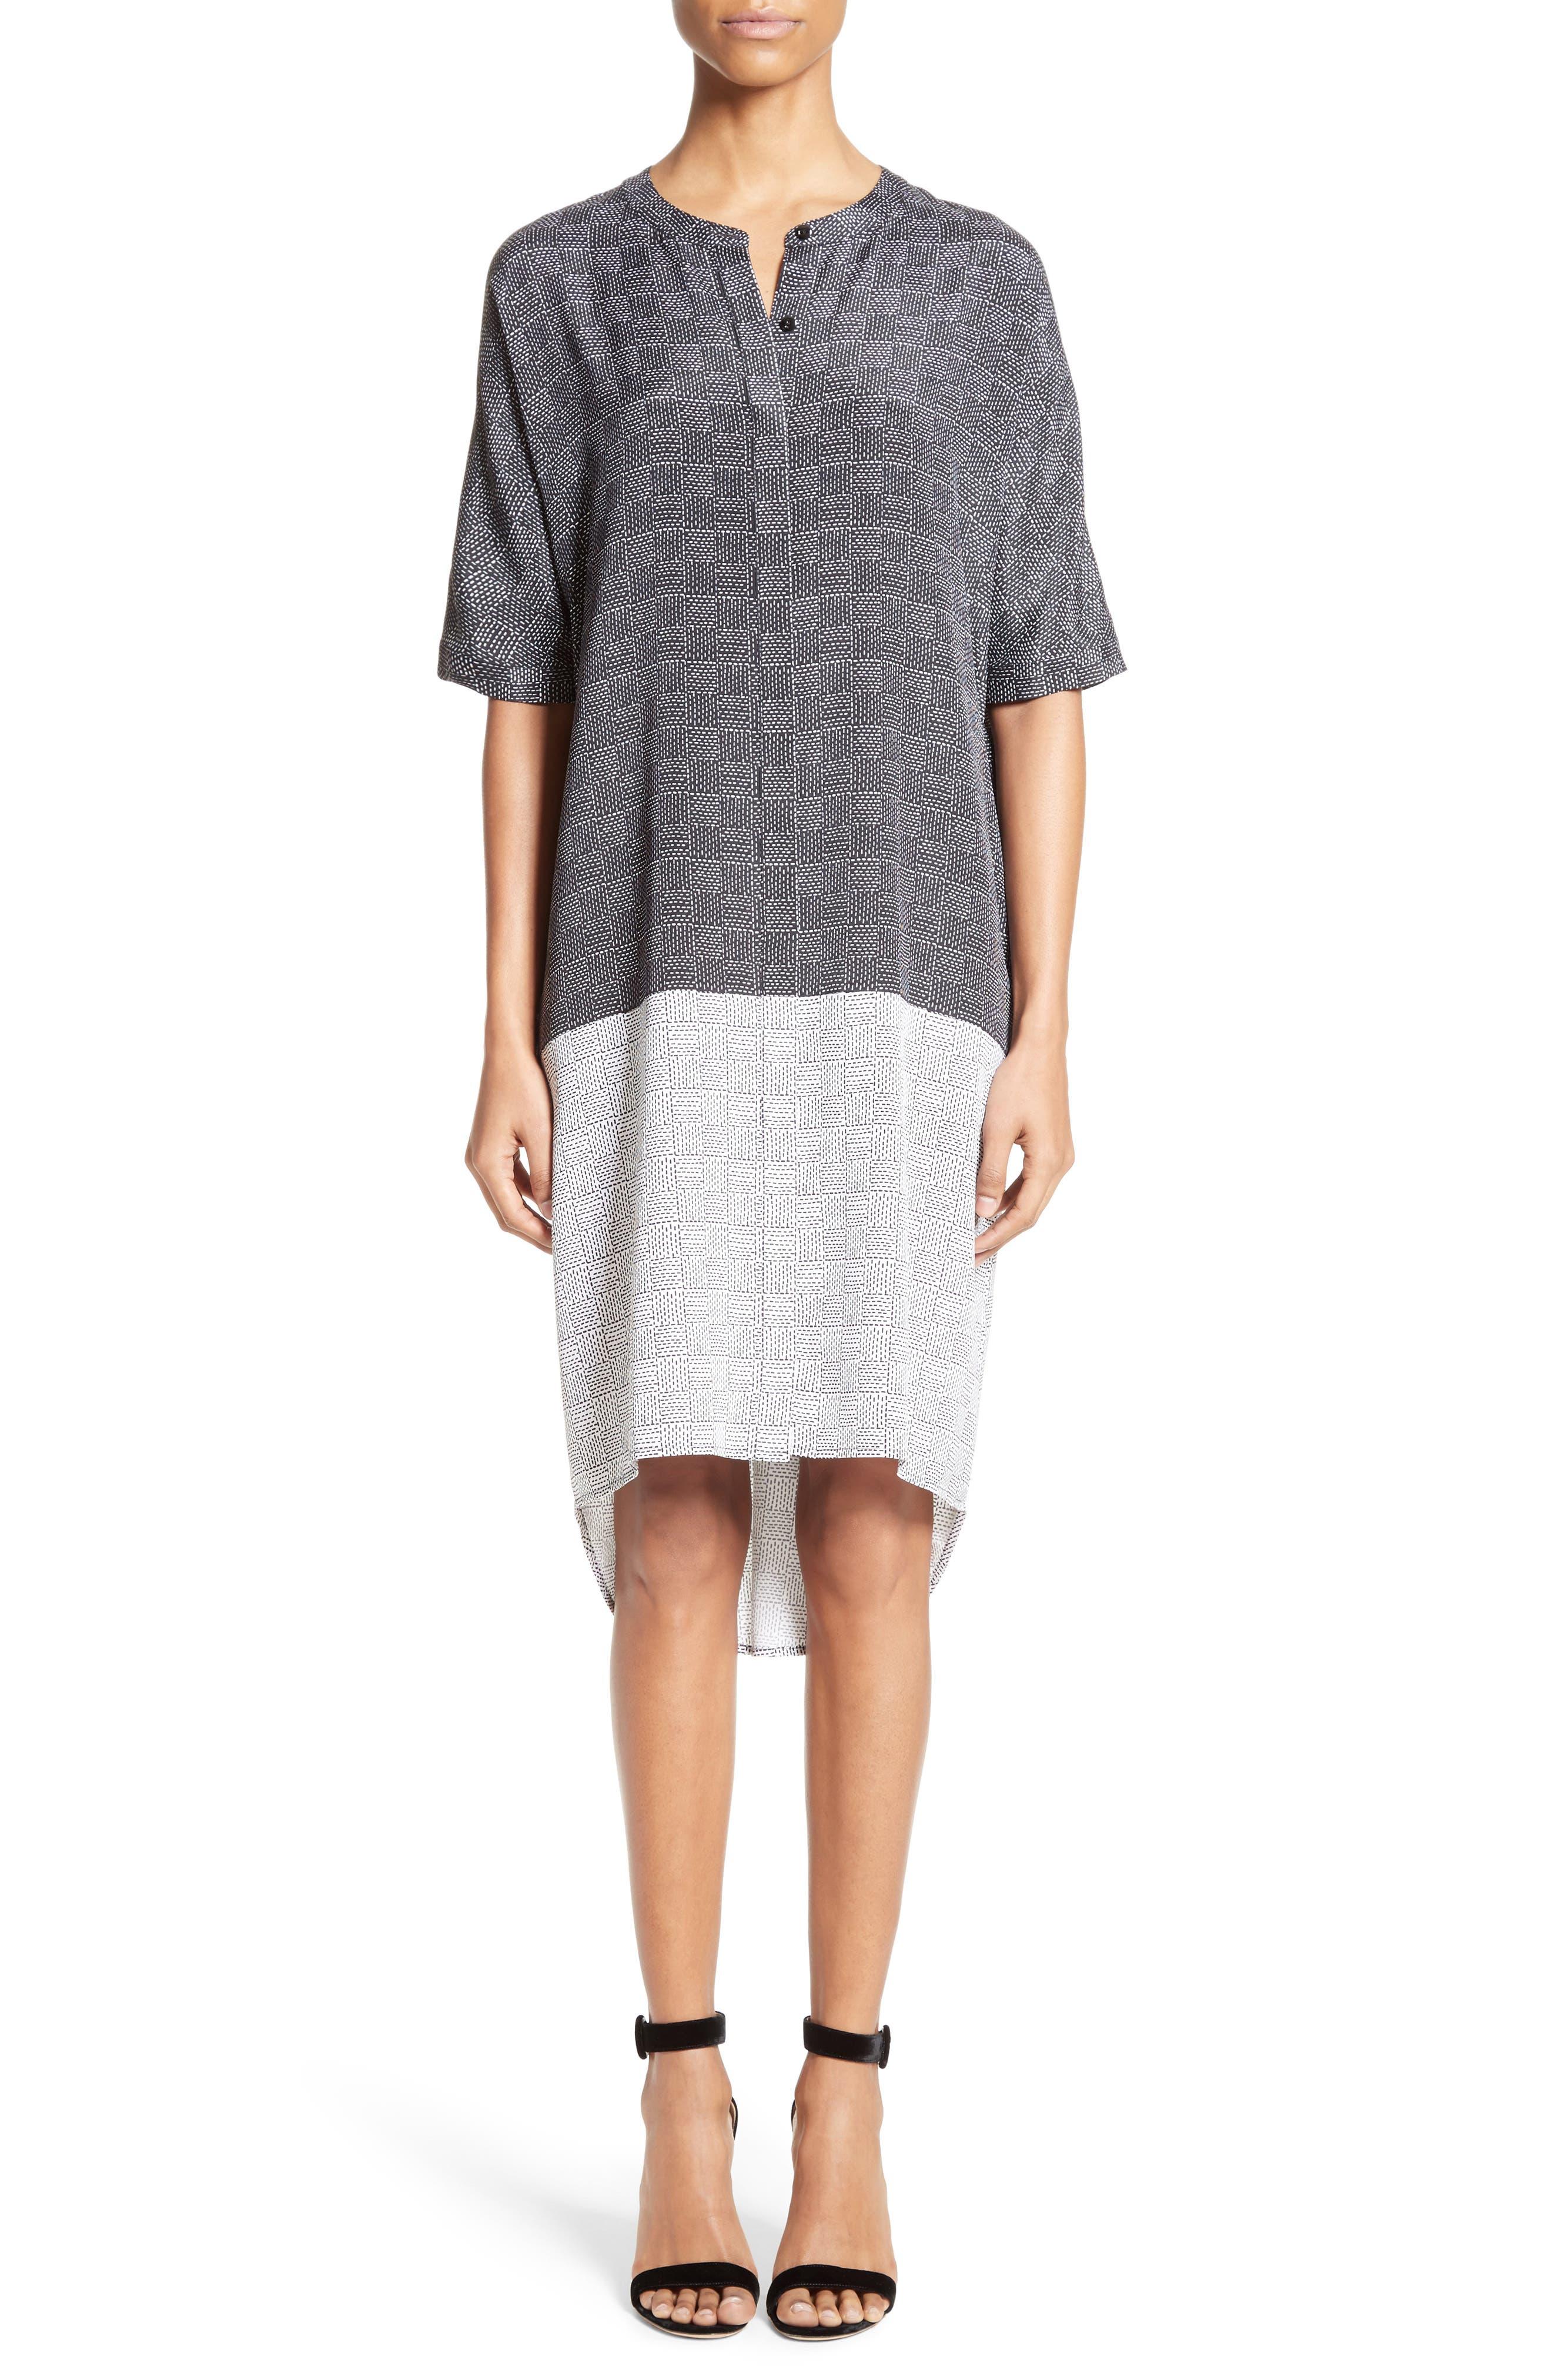 Alternate Image 1 Selected - St. John Collection Stitching Print Stretch Silk Shirtdress